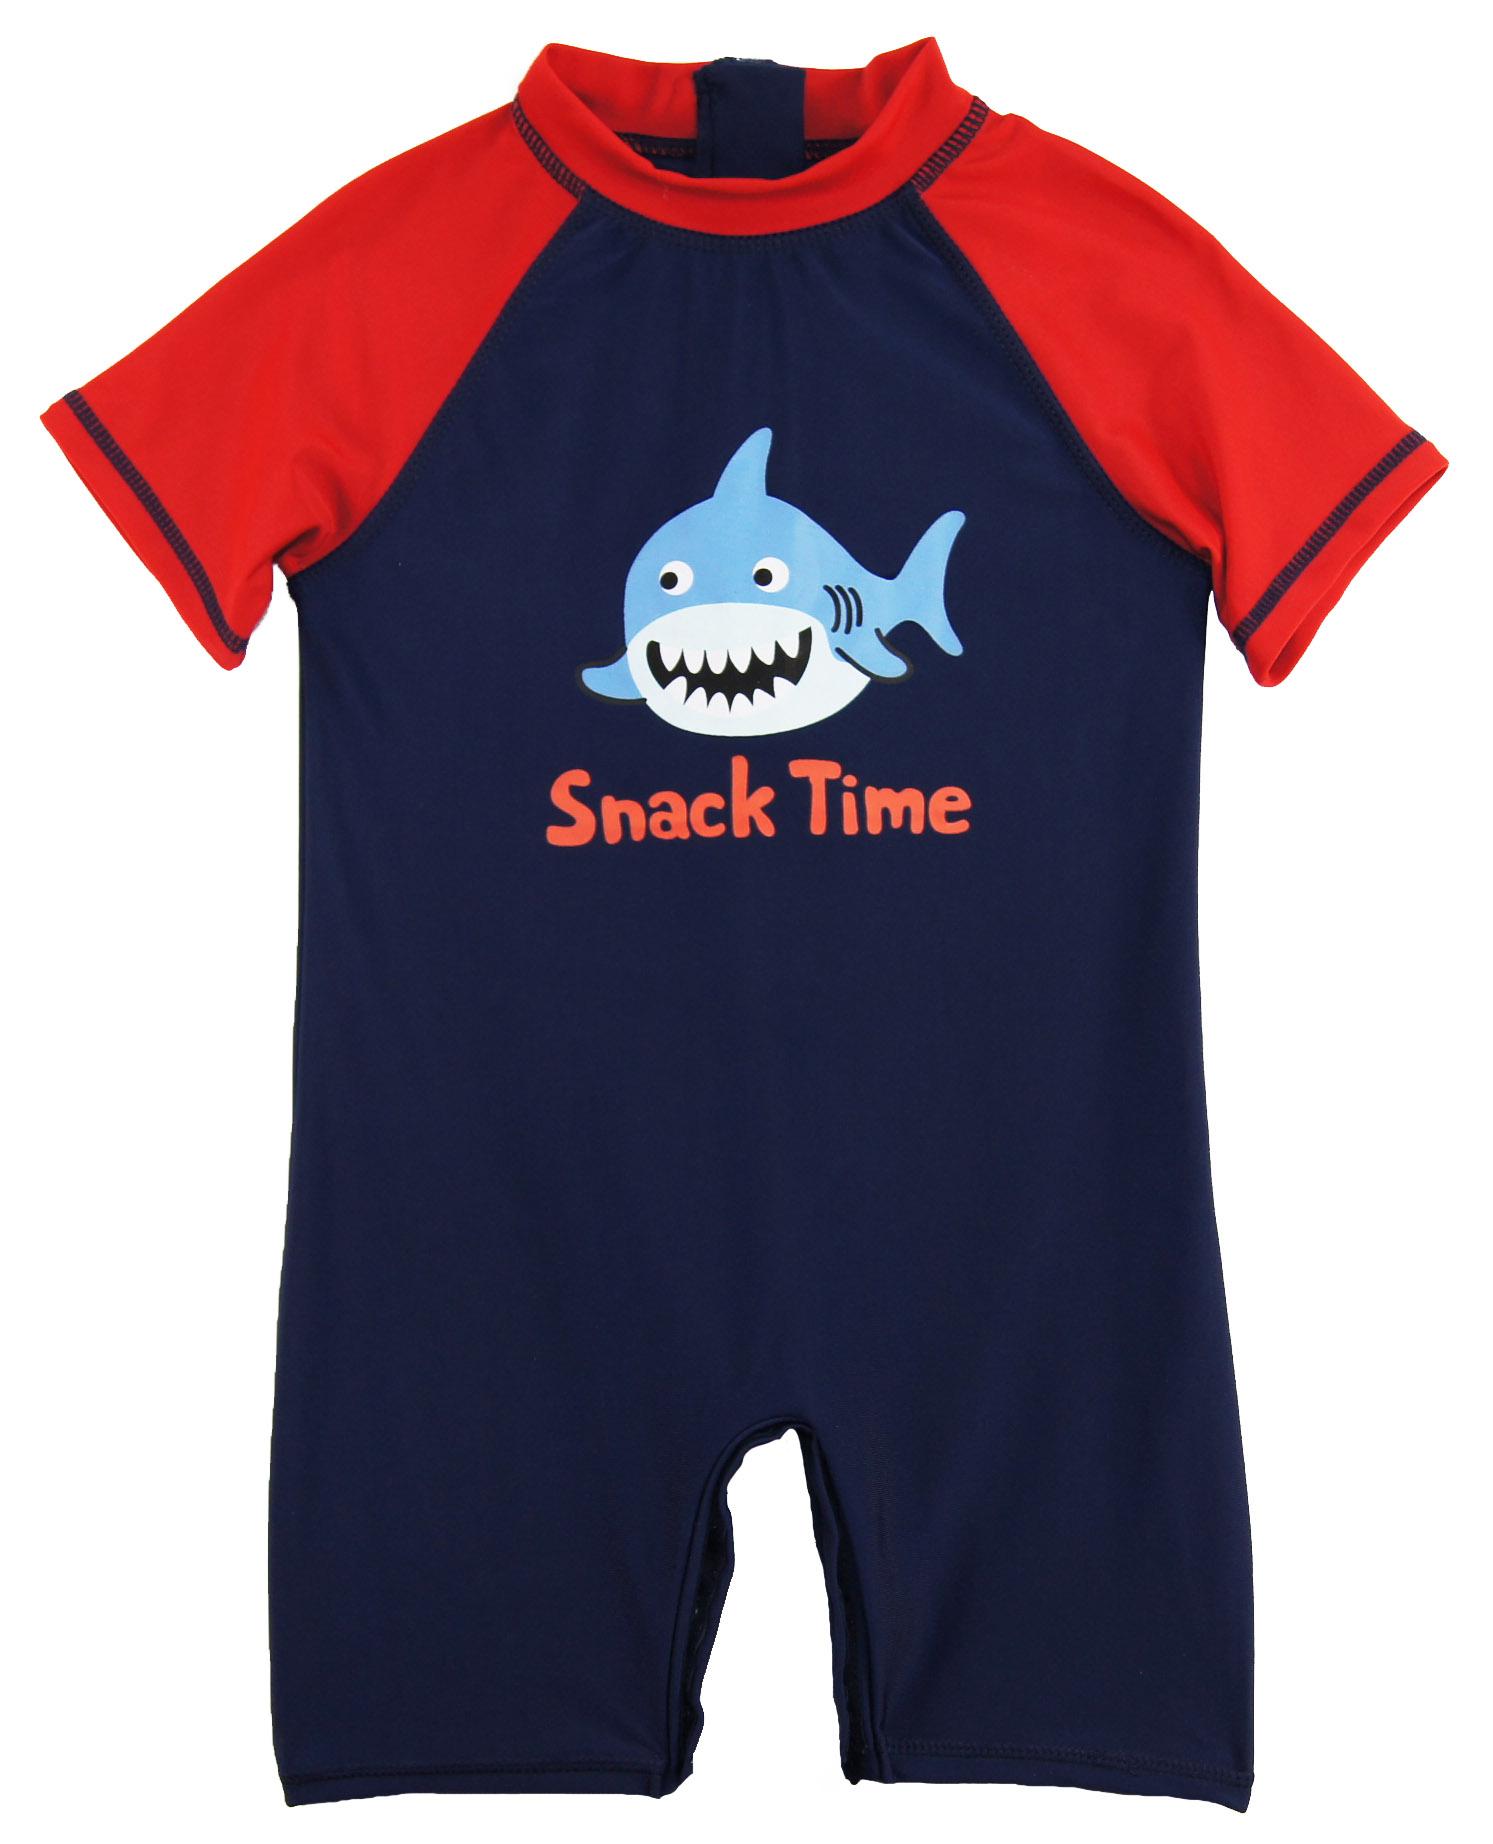 Sweet Soft Toddler Boys Swimwear Shark Snack Time Rashguard